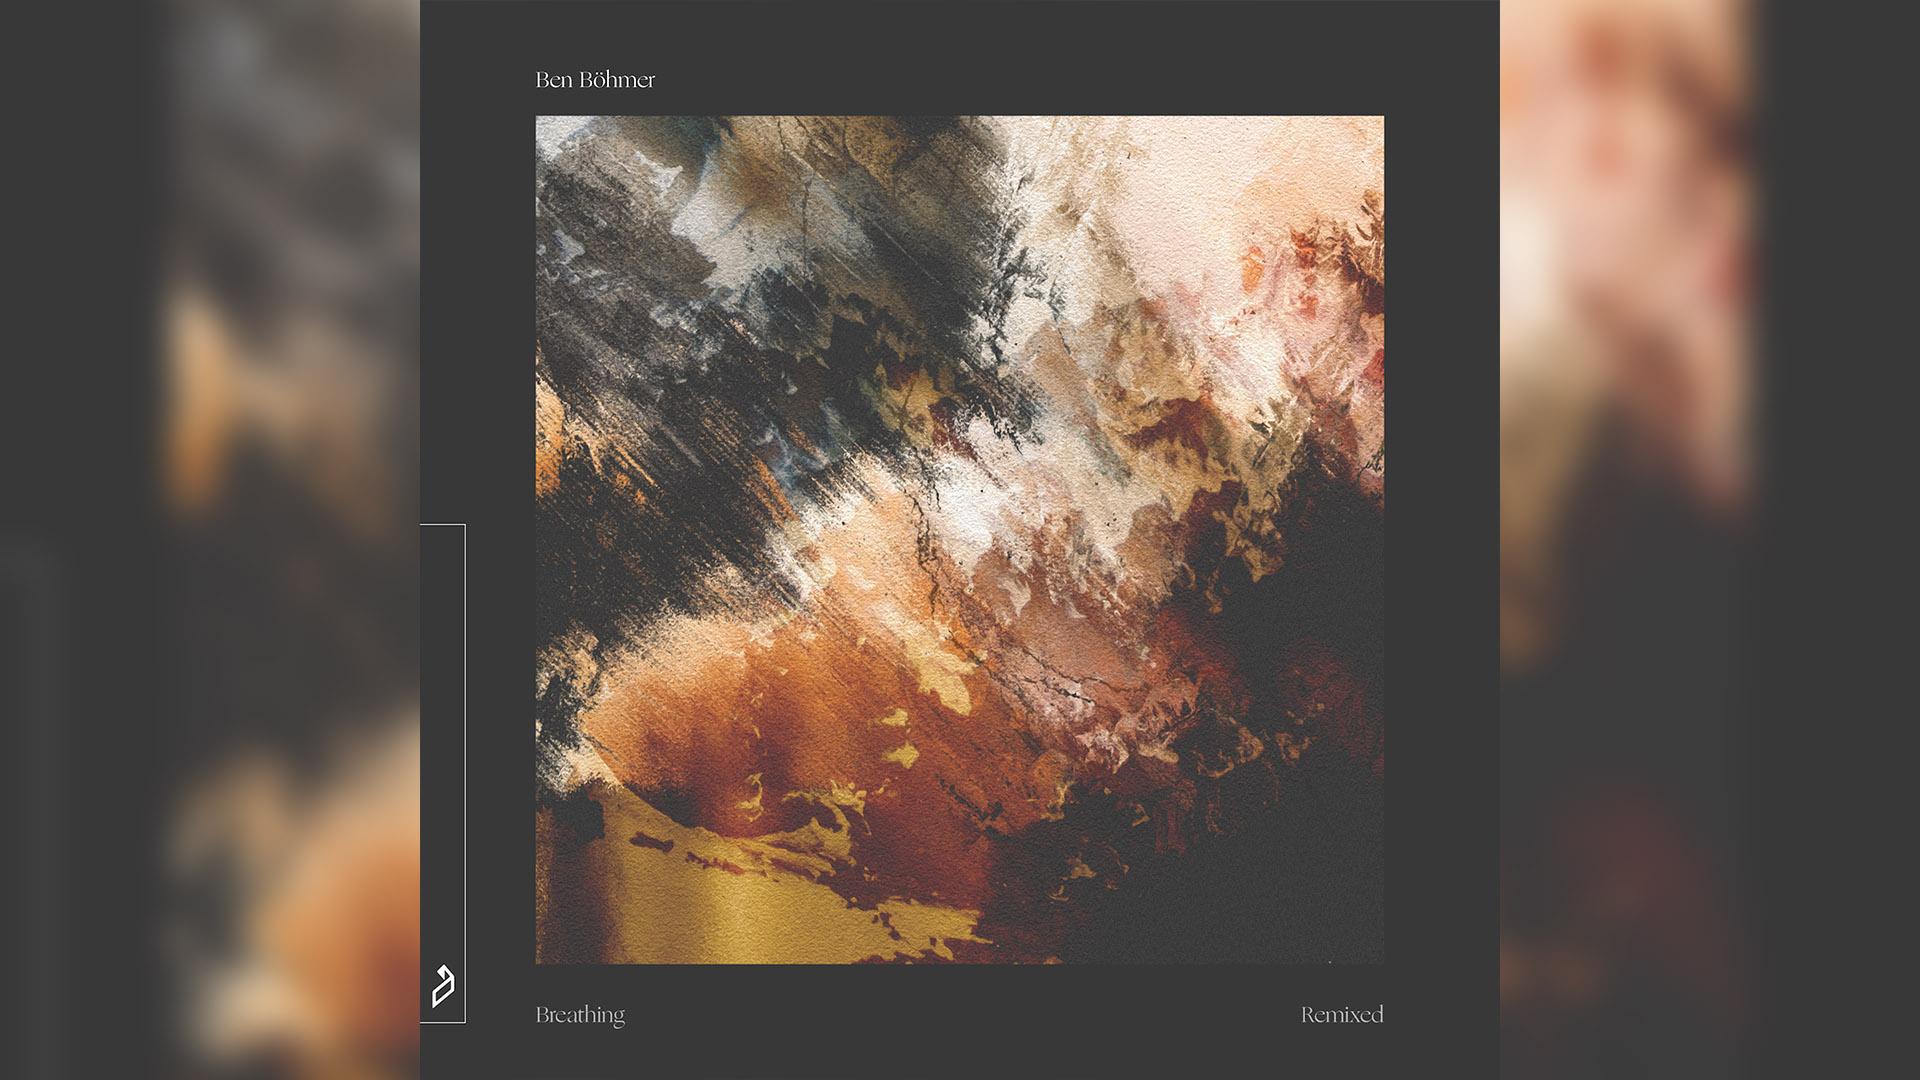 Breathing remix